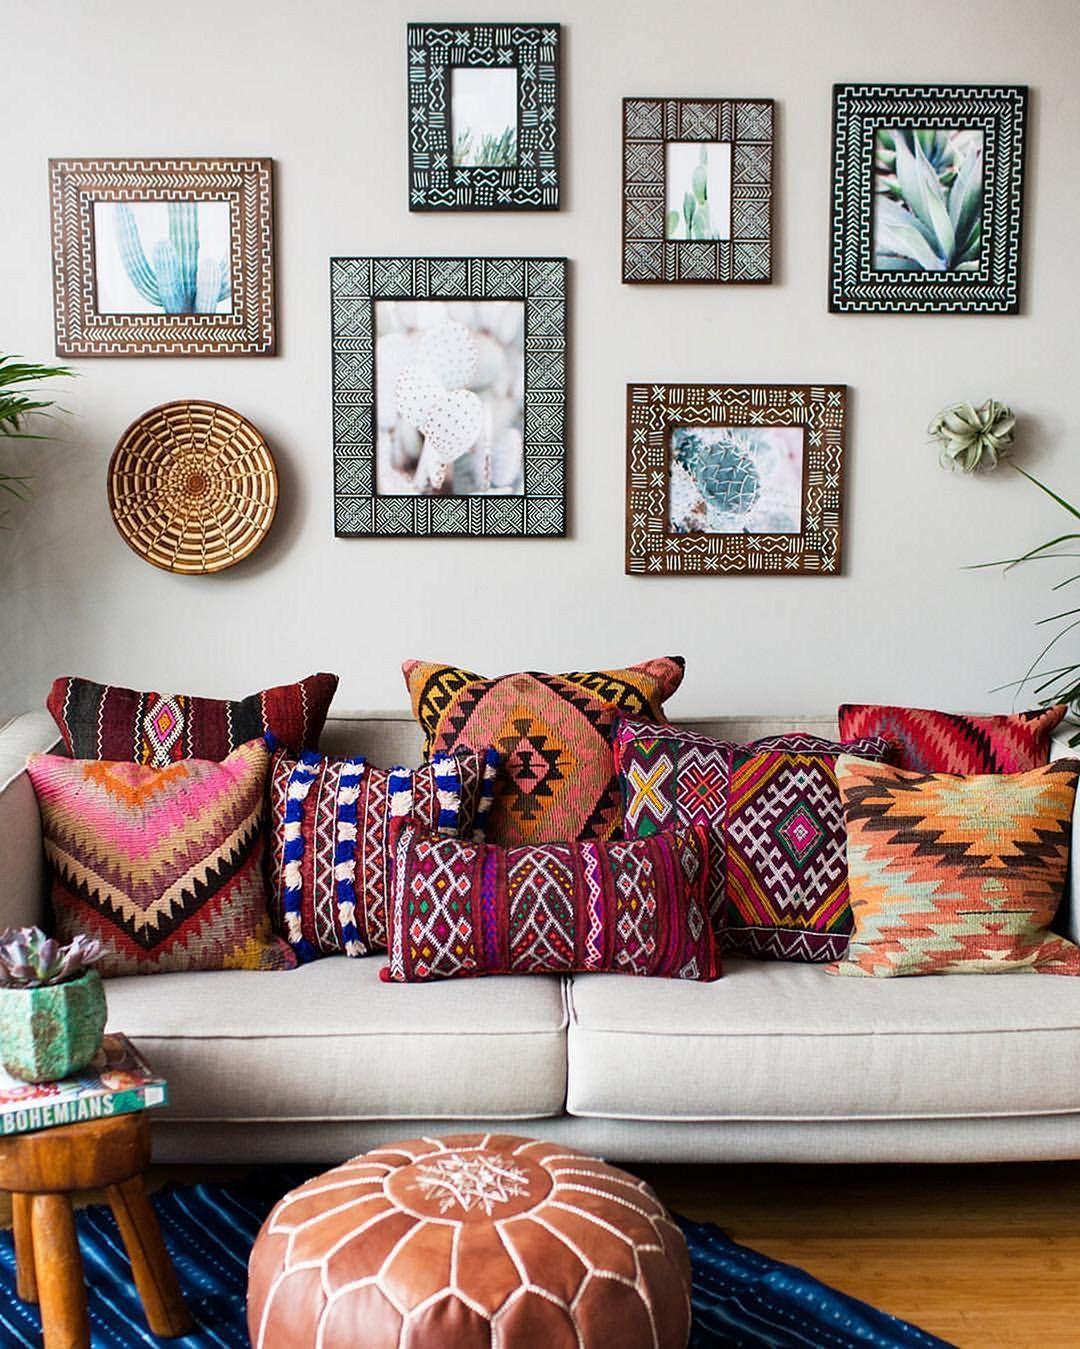 40 stylist boho chic home and apartment decor ideas pinterest